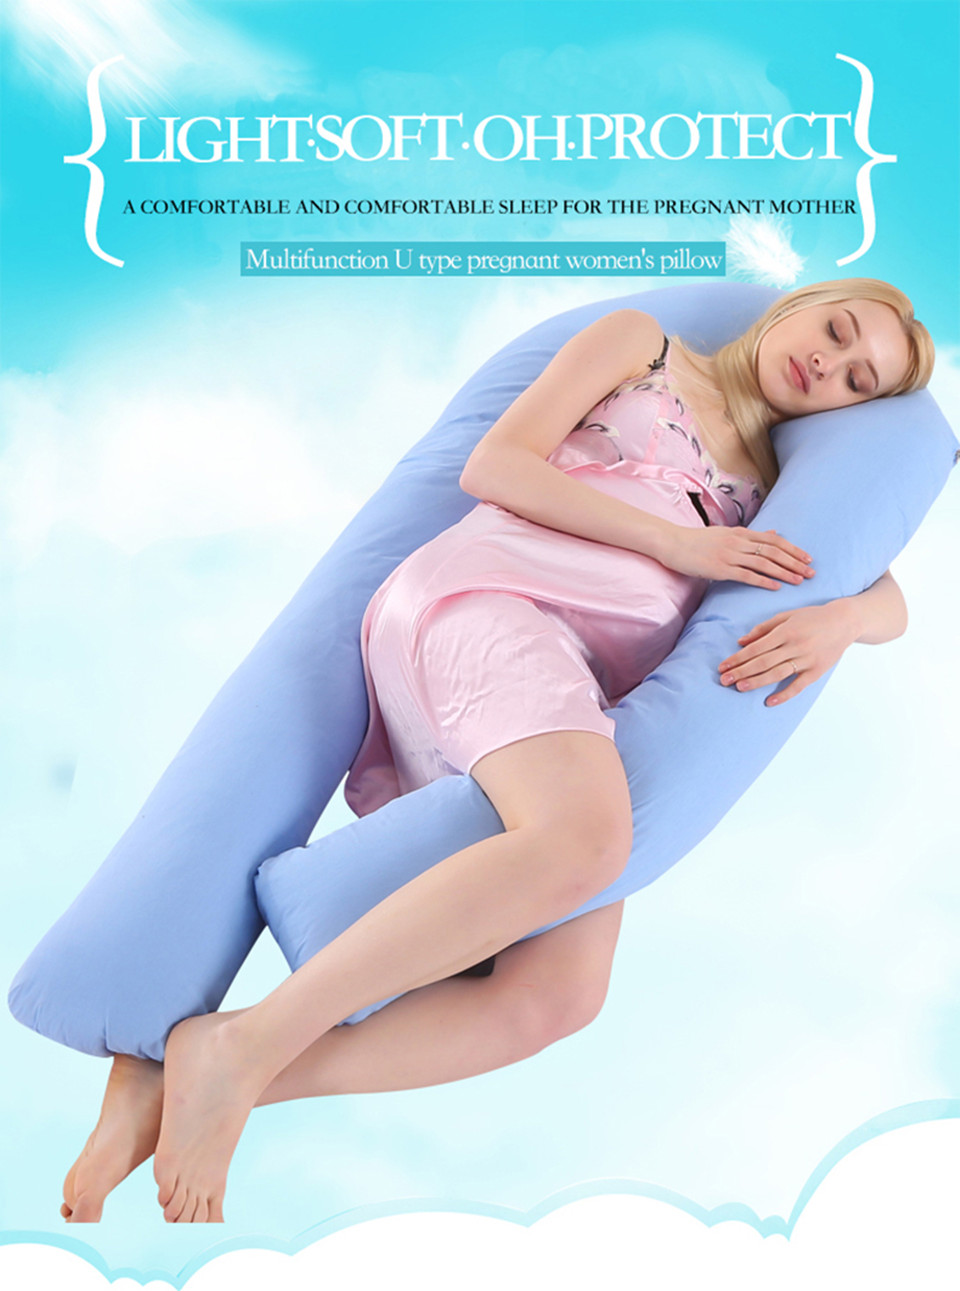 Bedding Pillows U Shape Pregnancy Pillow Full Body Maternity Pillow Comfort Sleeping Support Pillow For Pregnant Women Body _01_